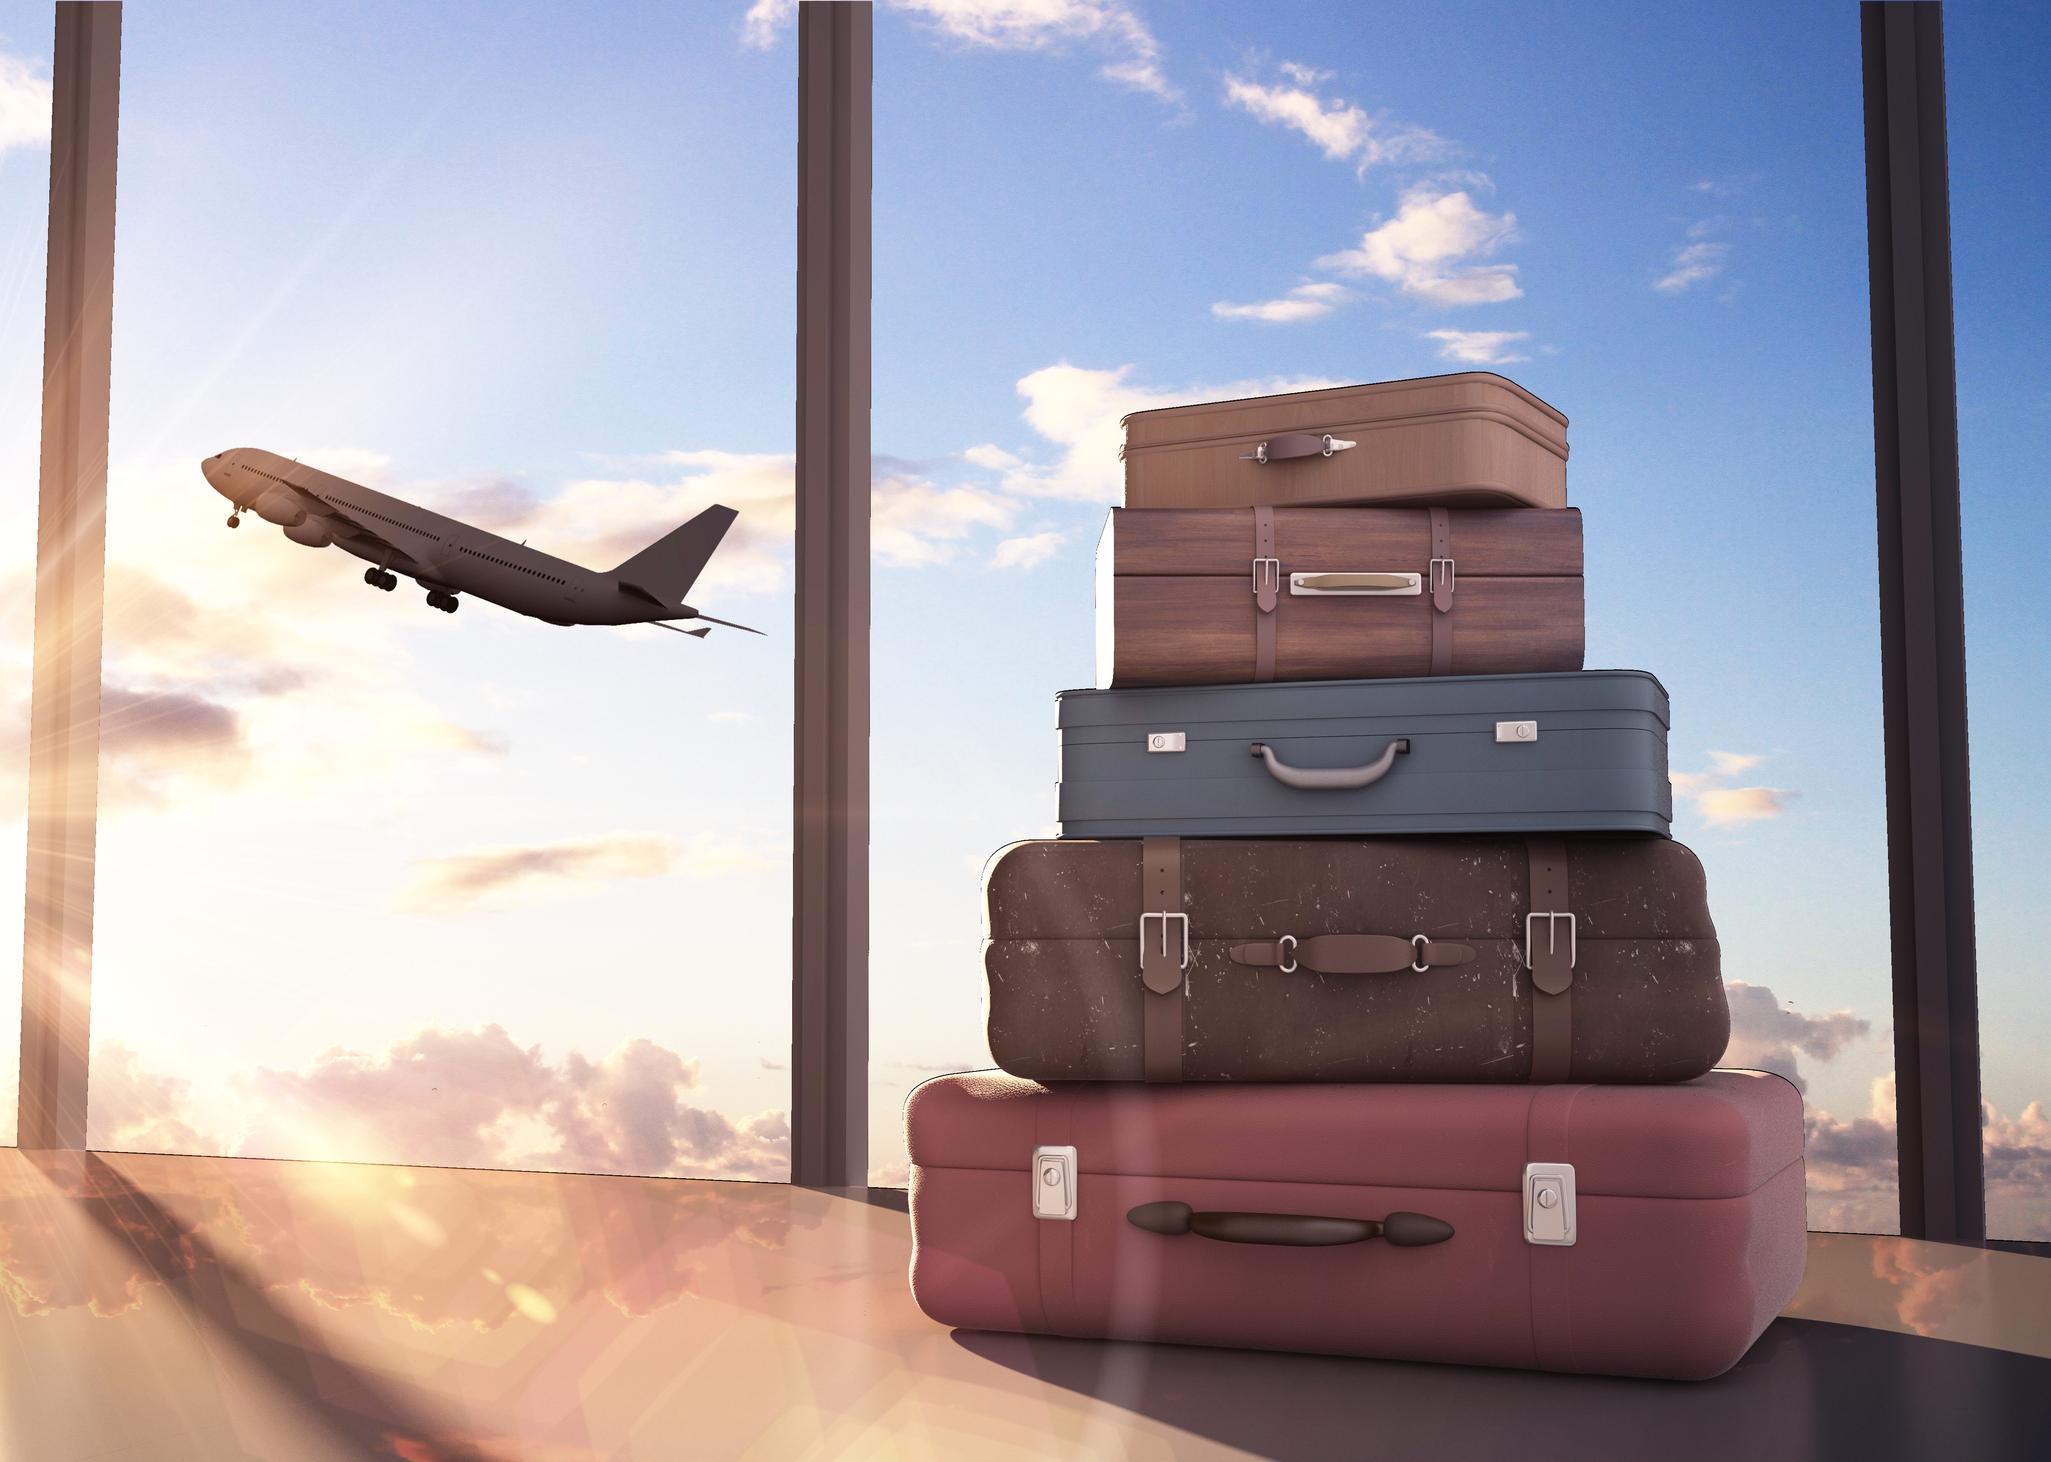 Риски на минимум: в каких случаях туристическая страховка спасет за границей